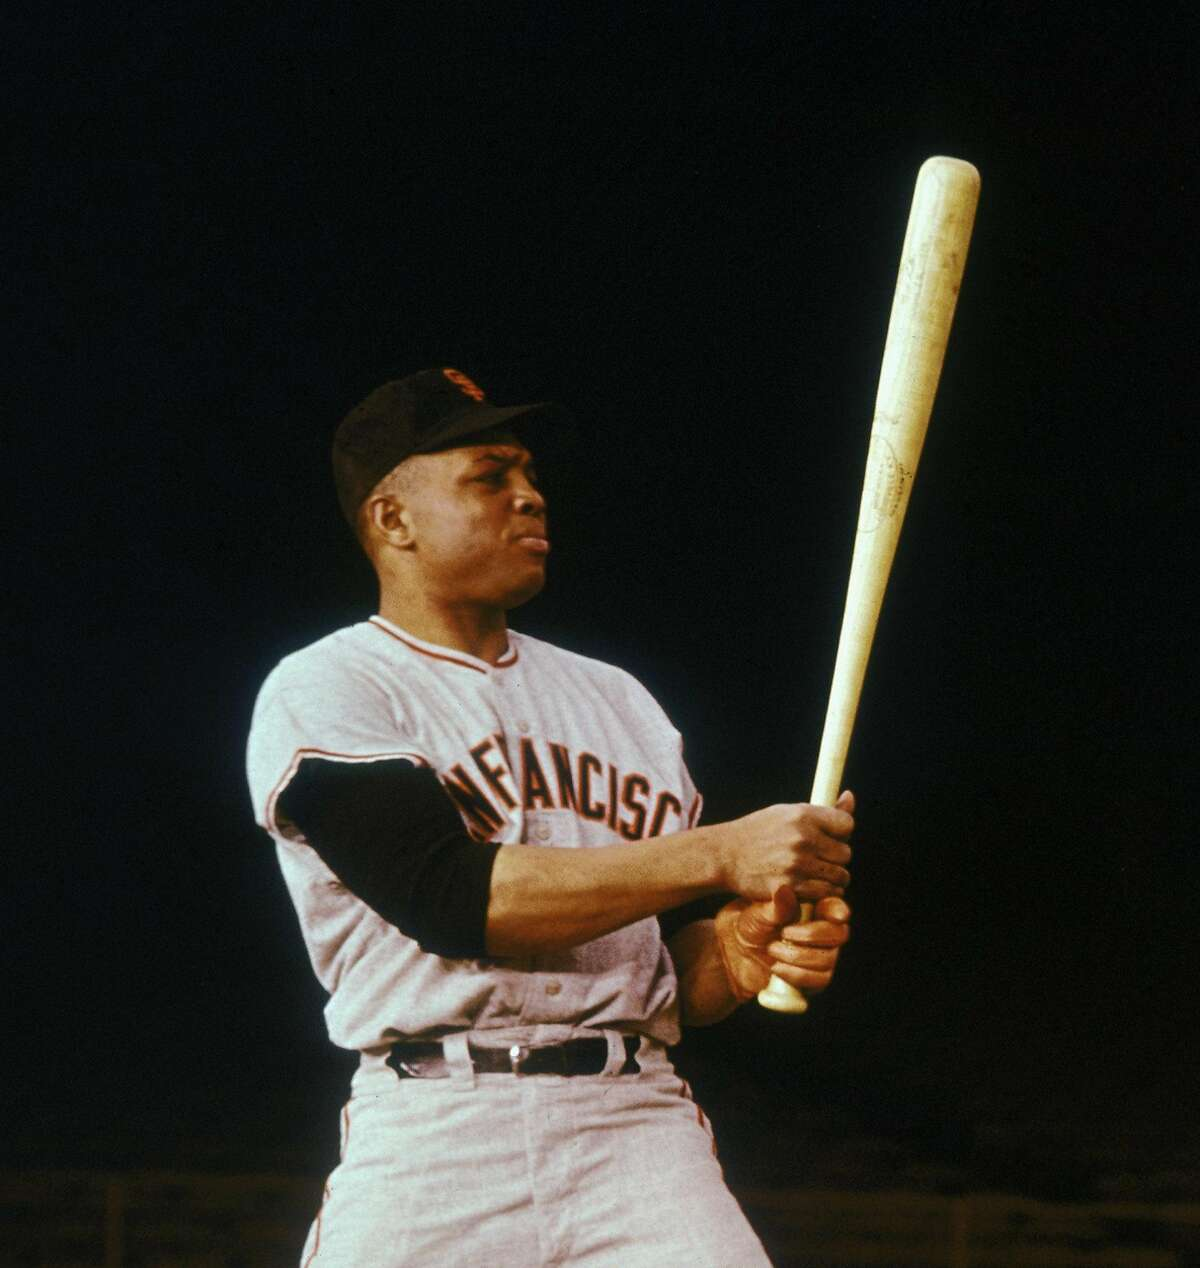 American baseball player Willie Mays of the San Francisco Giants, circa 1965. ~~